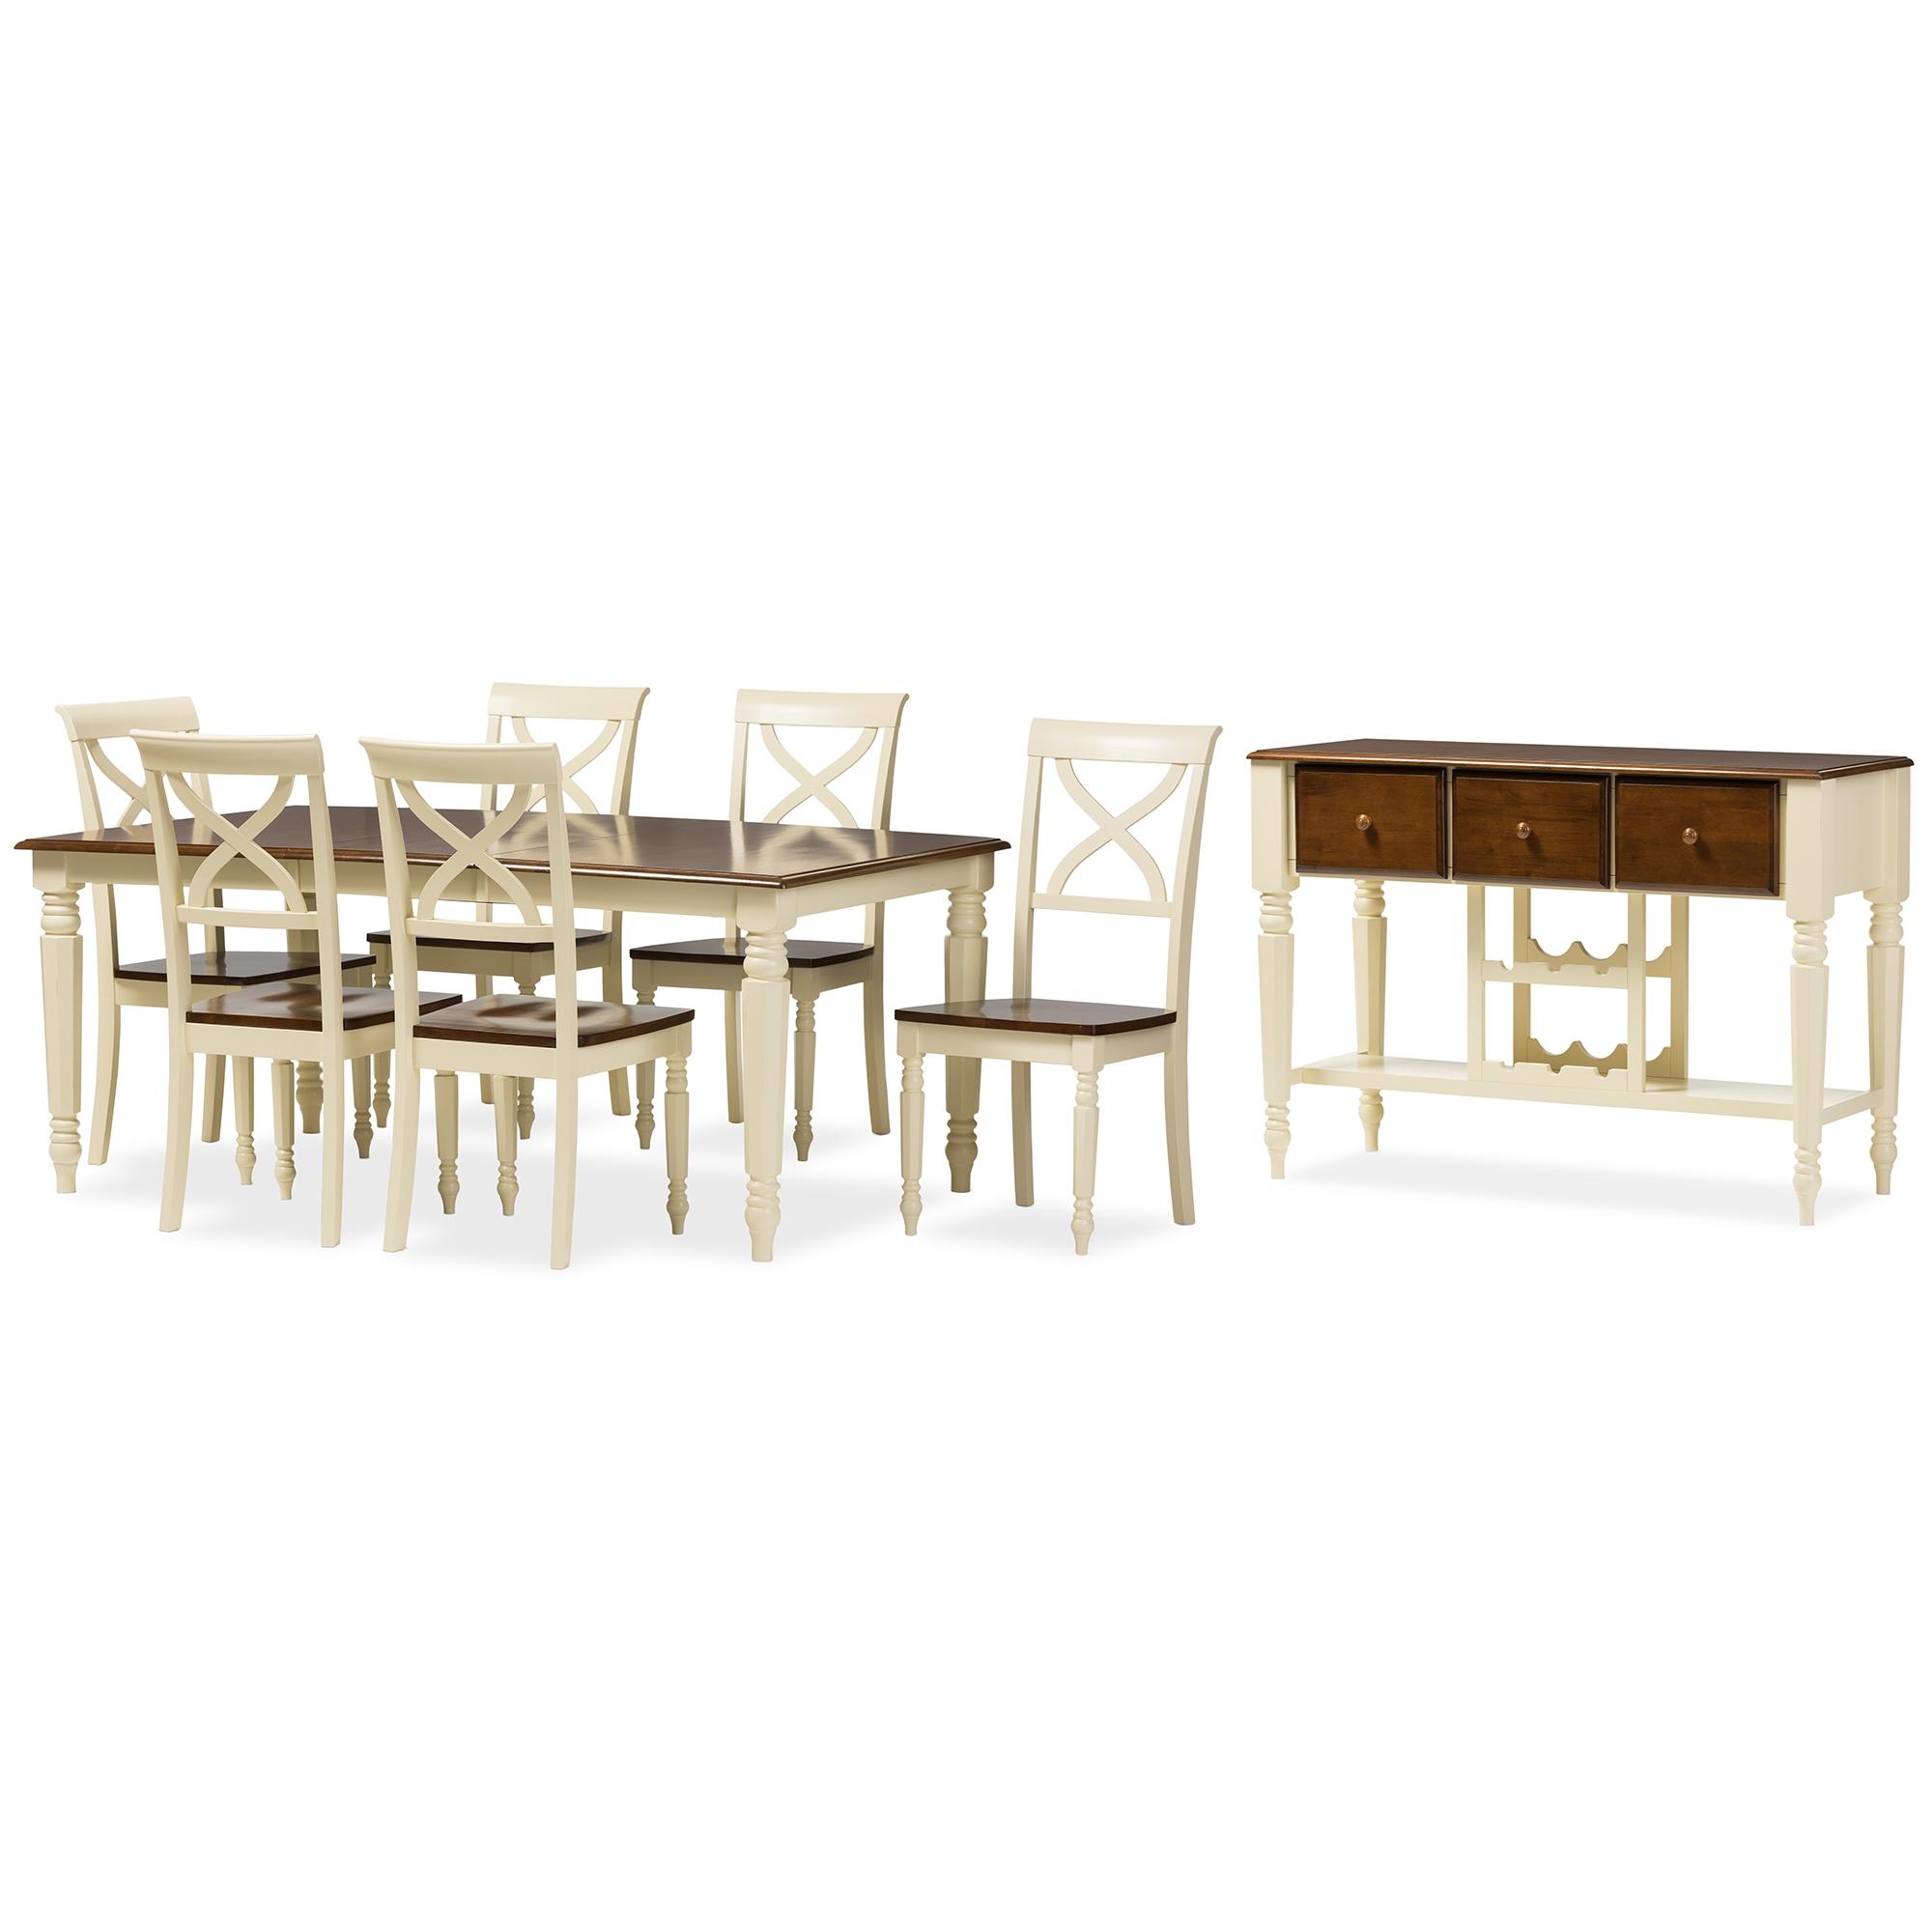 Baxton Studio | Wholesale 8 Piece Sets| Wholesale Dining Room Furniture | Wholesale  Furniture